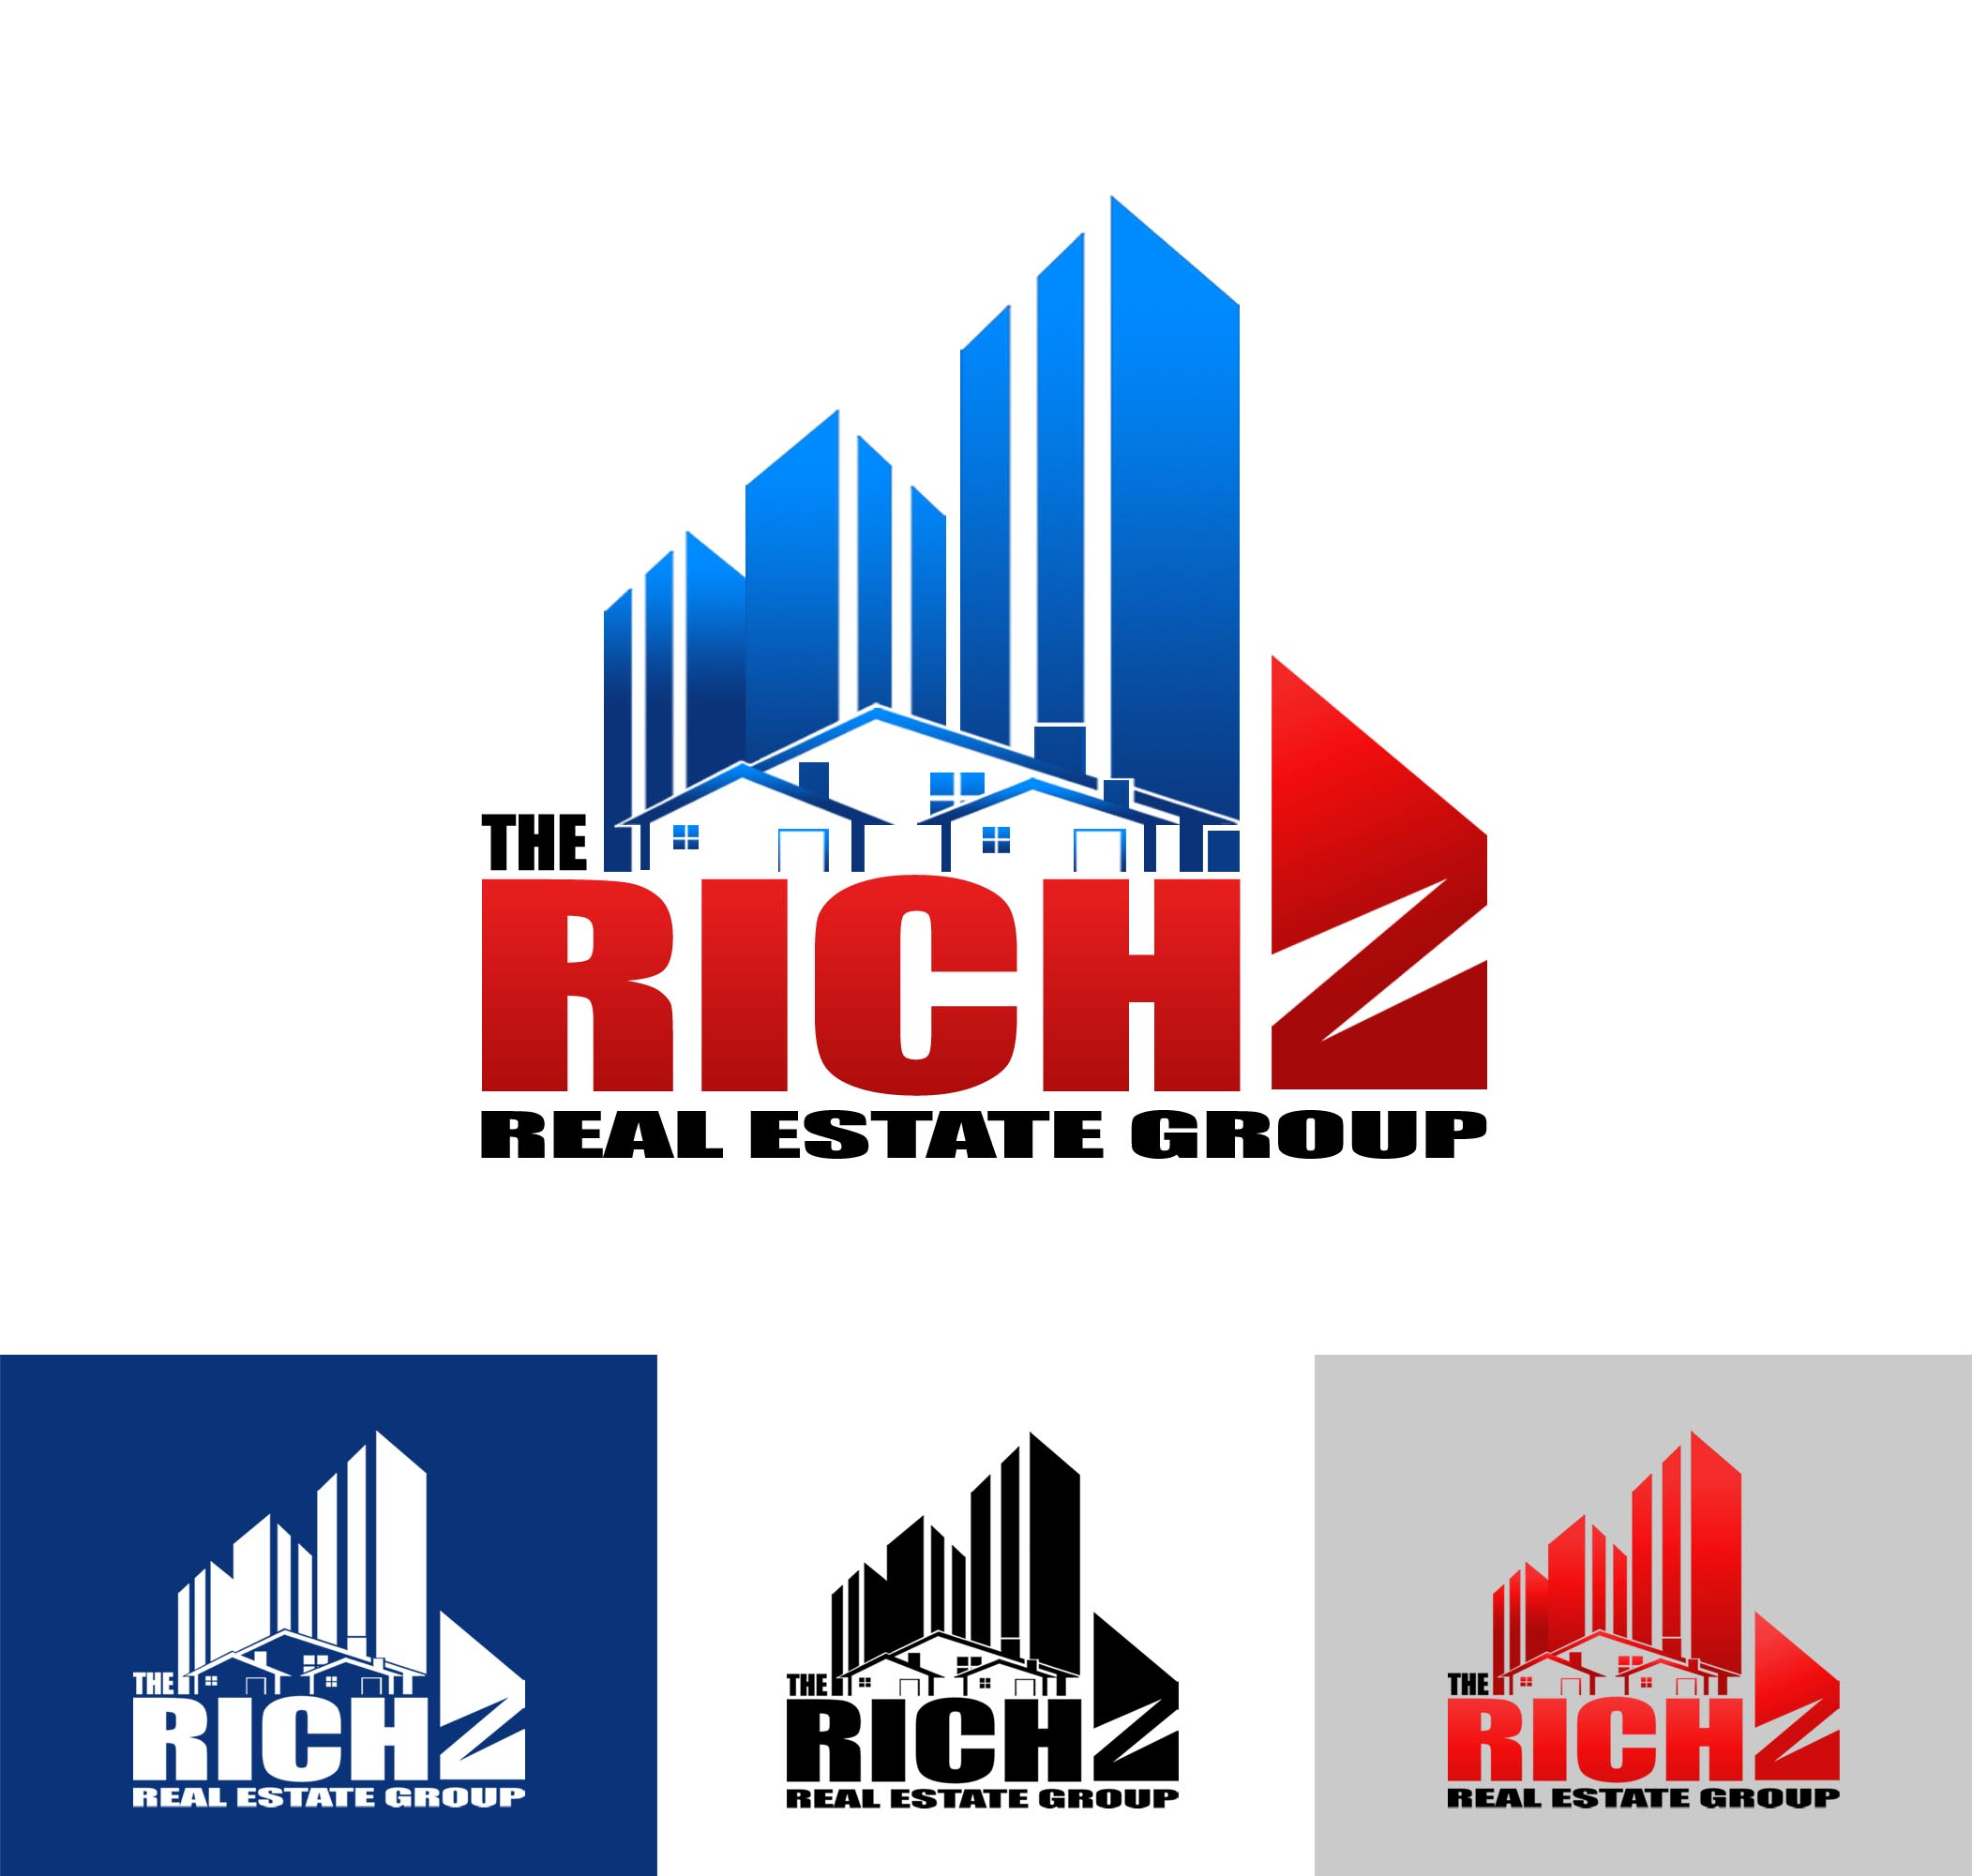 Logo Design by Cesar III Sotto - Entry No. 219 in the Logo Design Contest The Rich Z. Real Estate Group Logo Design.